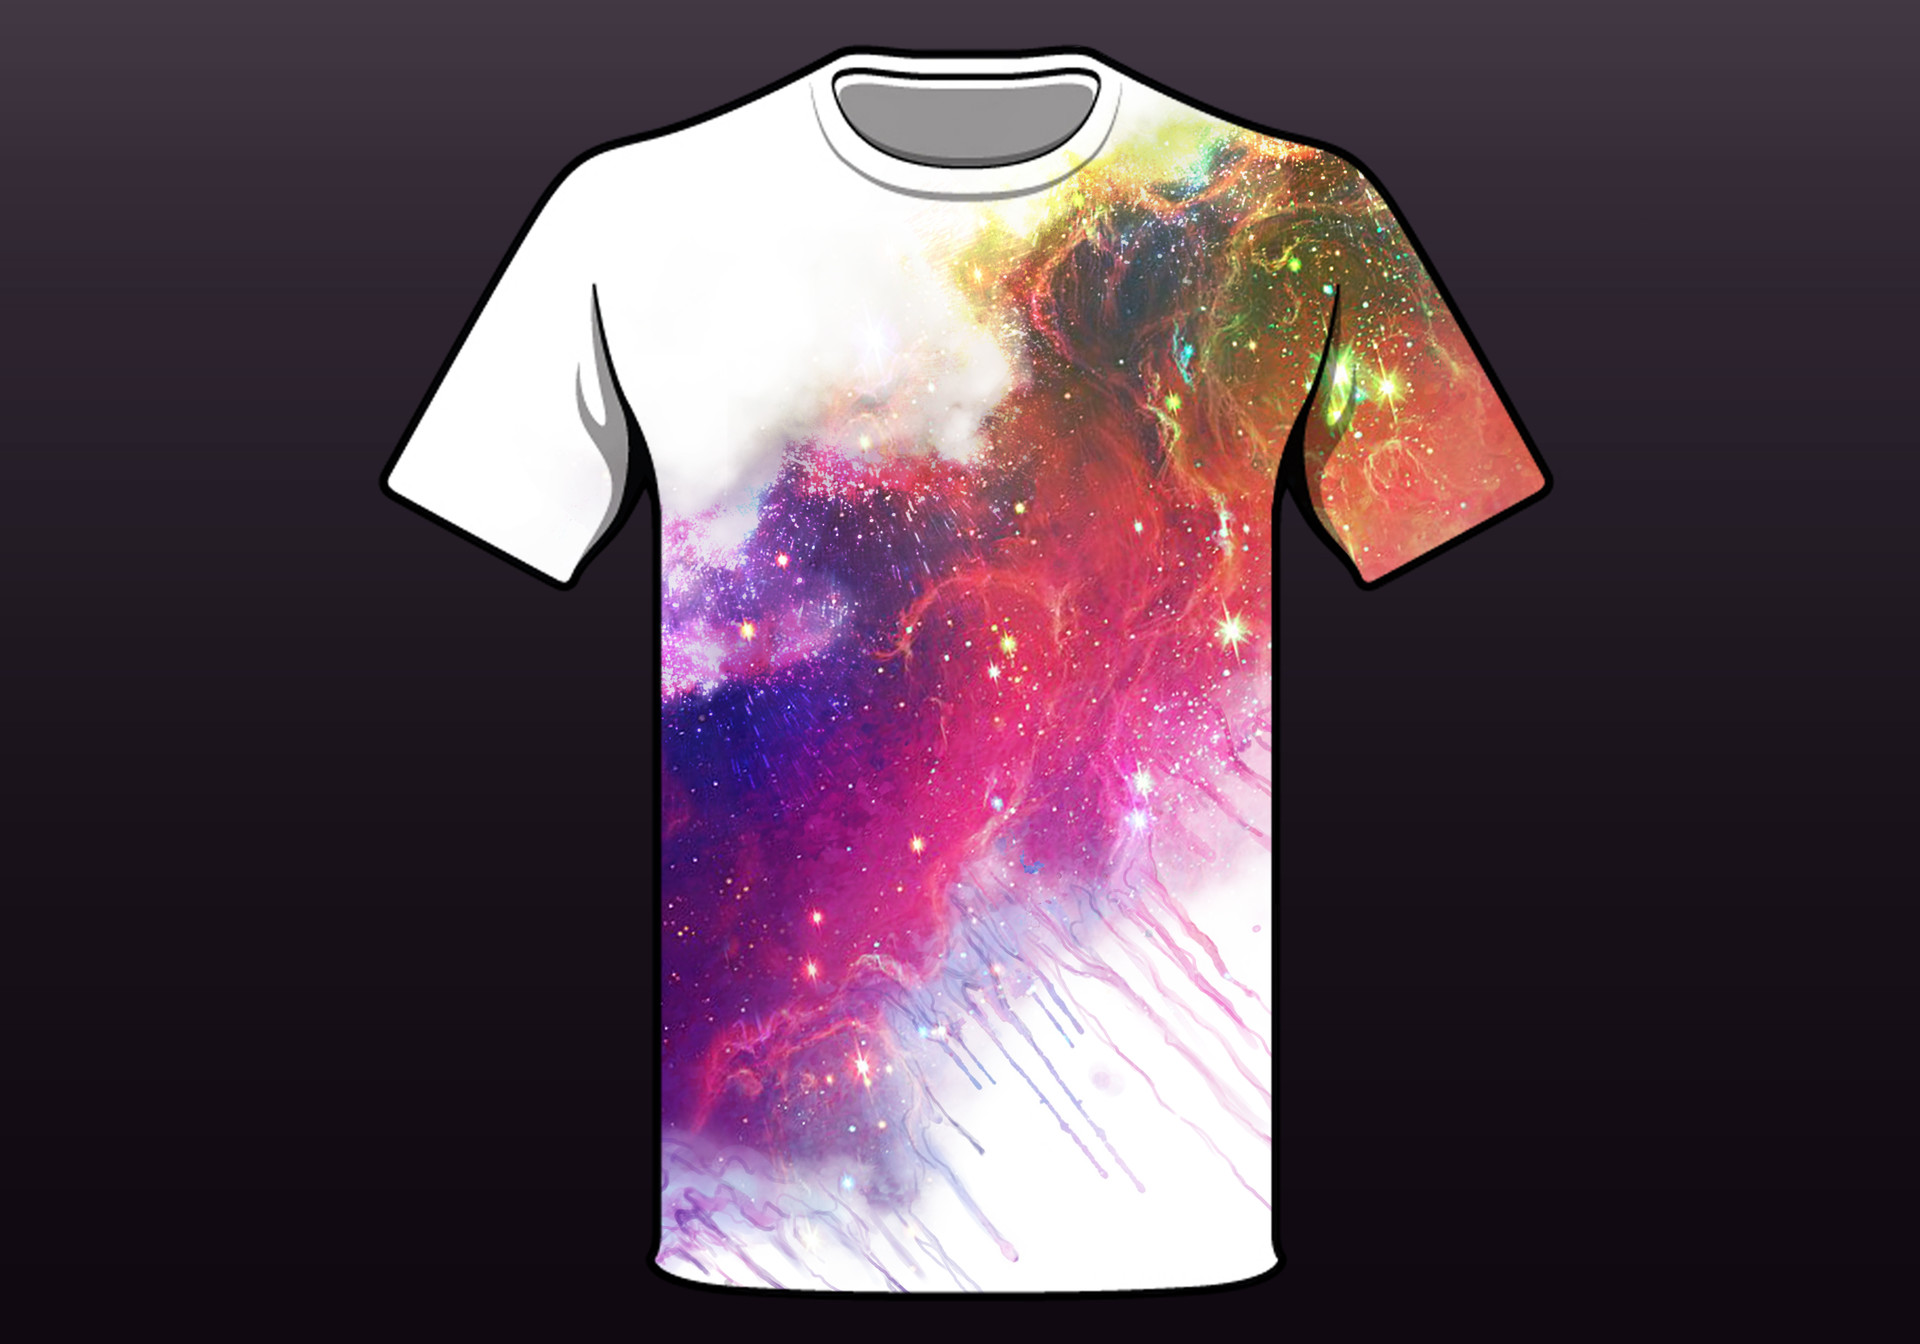 dal costo ragionevole immagini ufficiali amazon ArtStation - Celestial T-Shirt Designs, Edward C. Thomas III